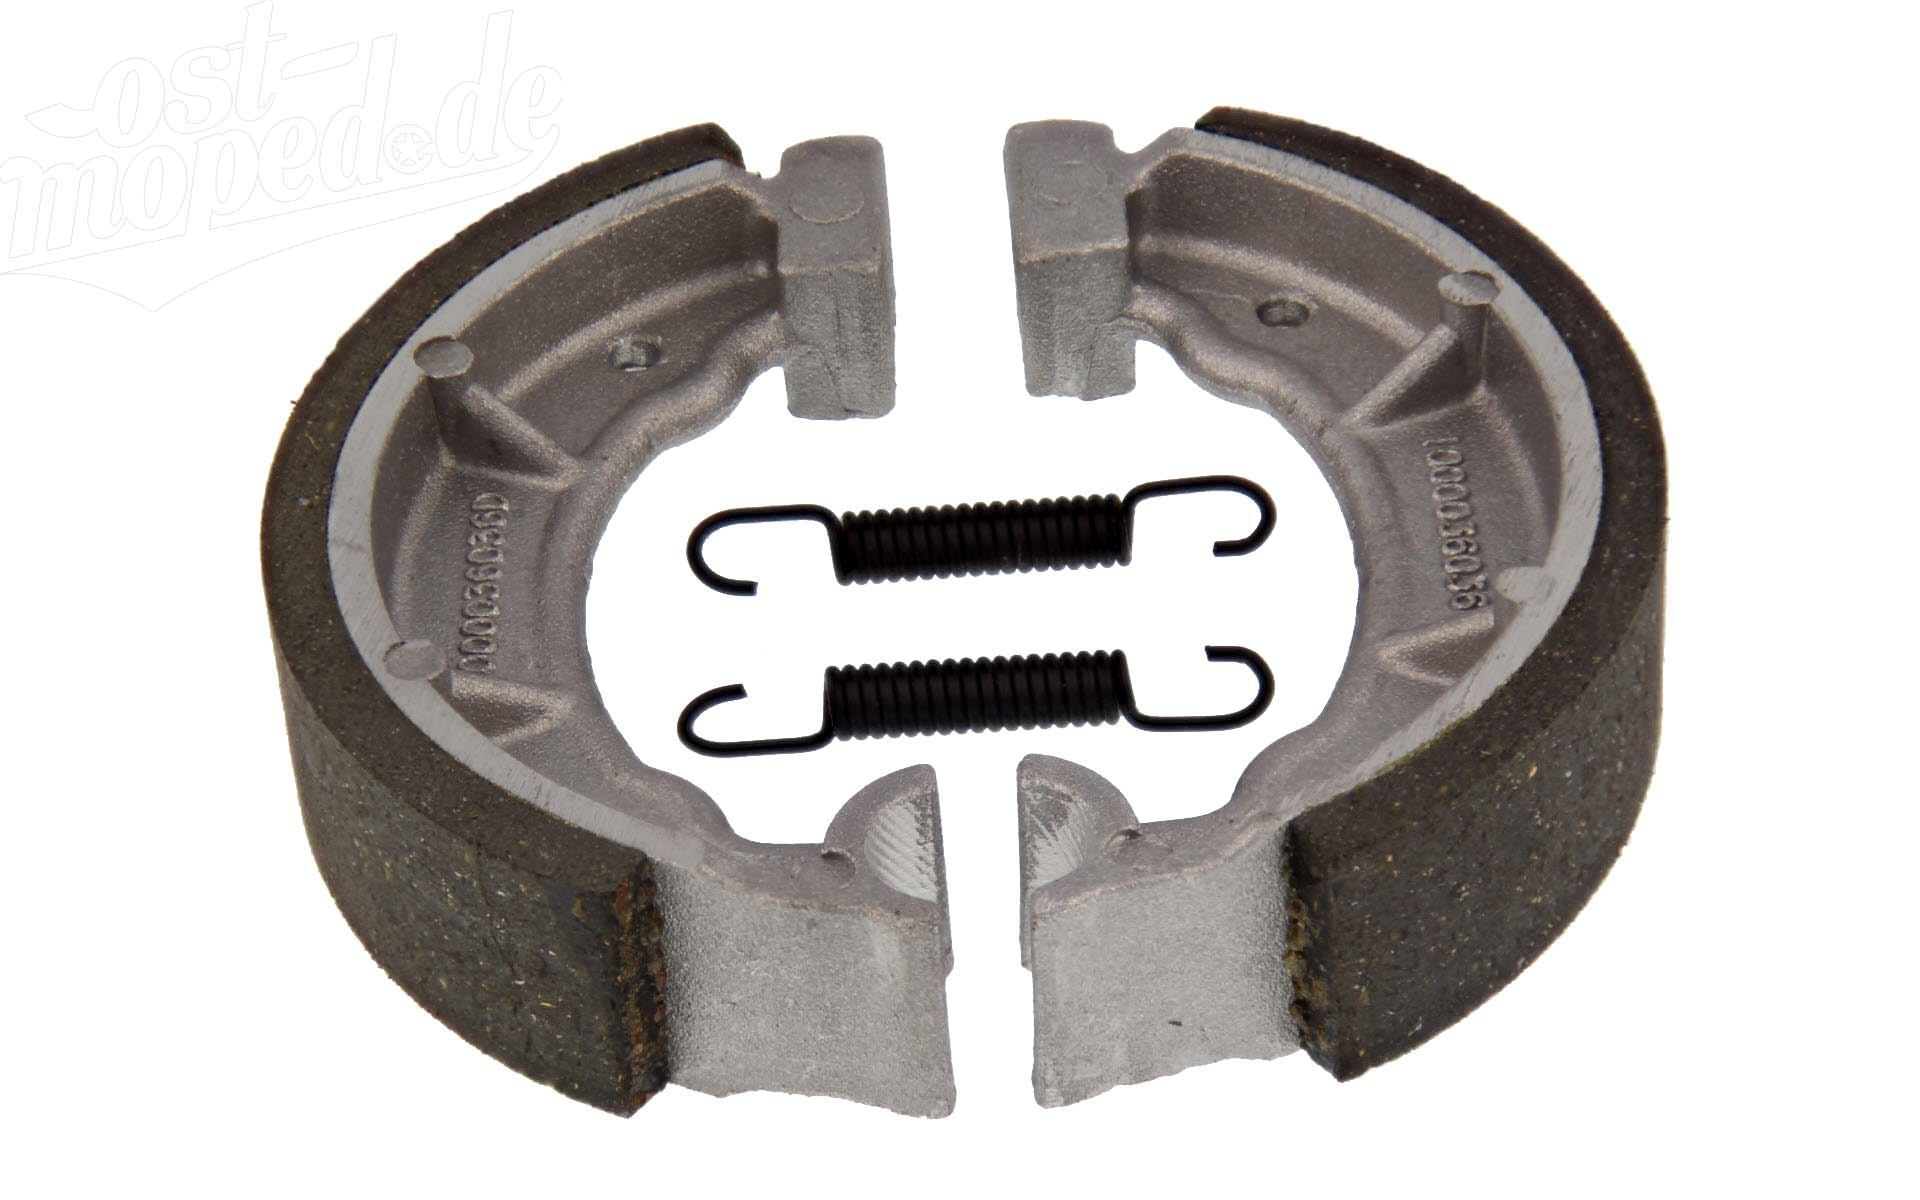 SR2 Set: Bremsbacke SR2E KR50 für Simson SR2 KR50